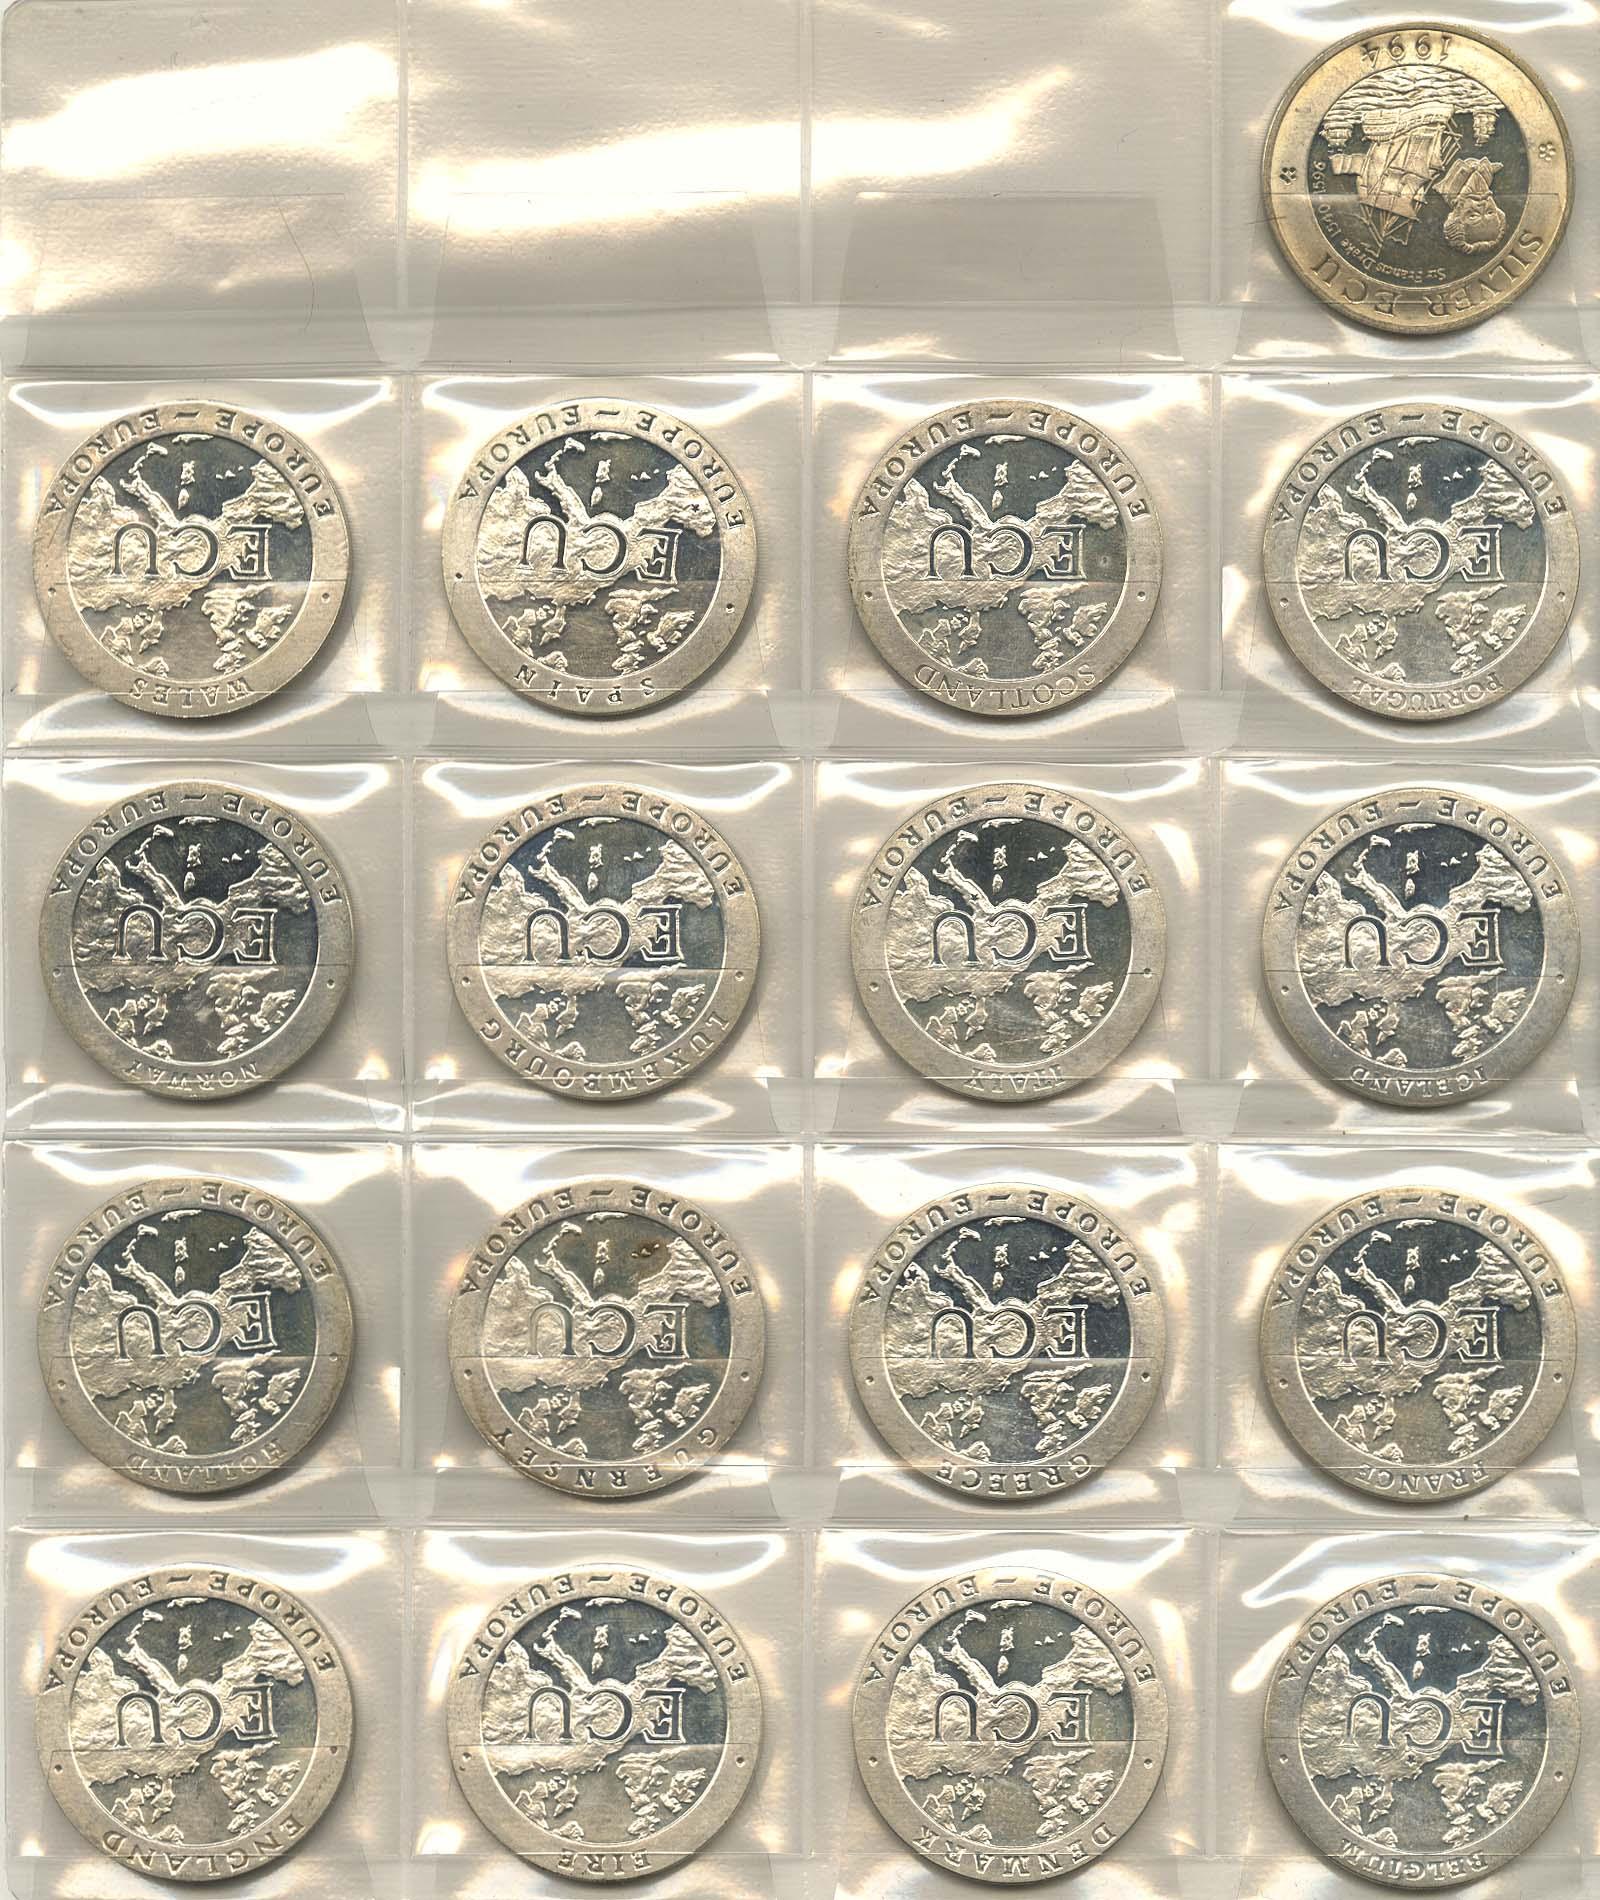 Lot 9508 - sammlungen Thematik - ECU -  Auktionshaus Ulrich Felzmann GmbH & Co. KG Coins single lots